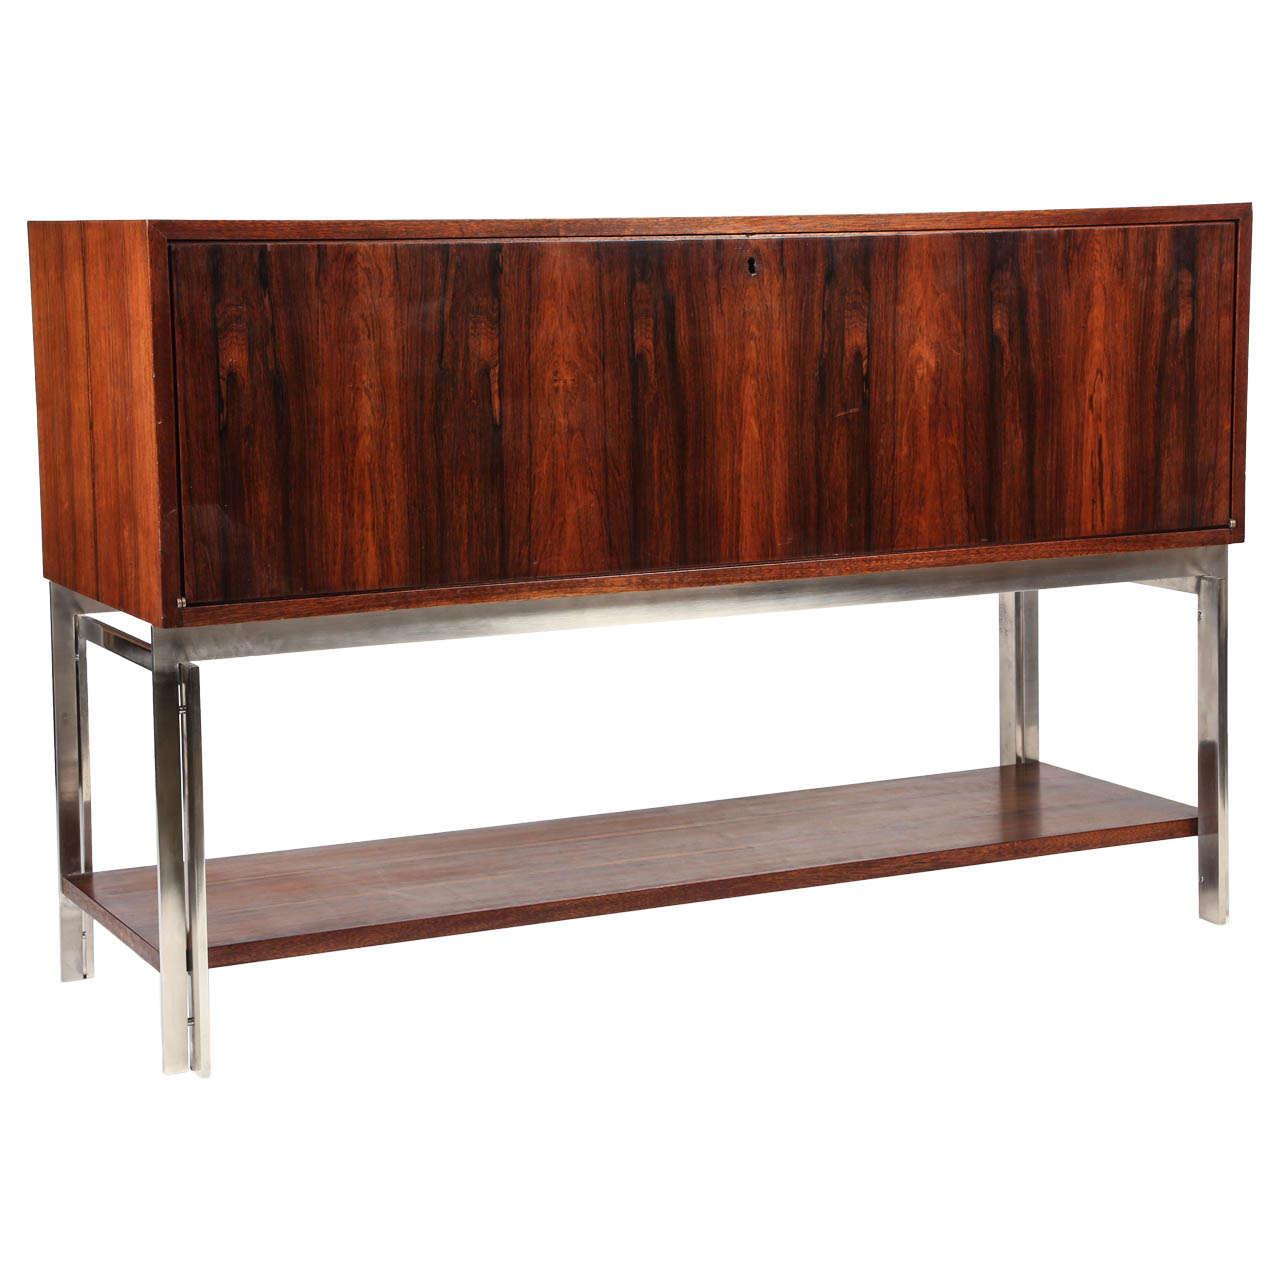 mid century palisander wood sideboard at 1stdibs. Black Bedroom Furniture Sets. Home Design Ideas